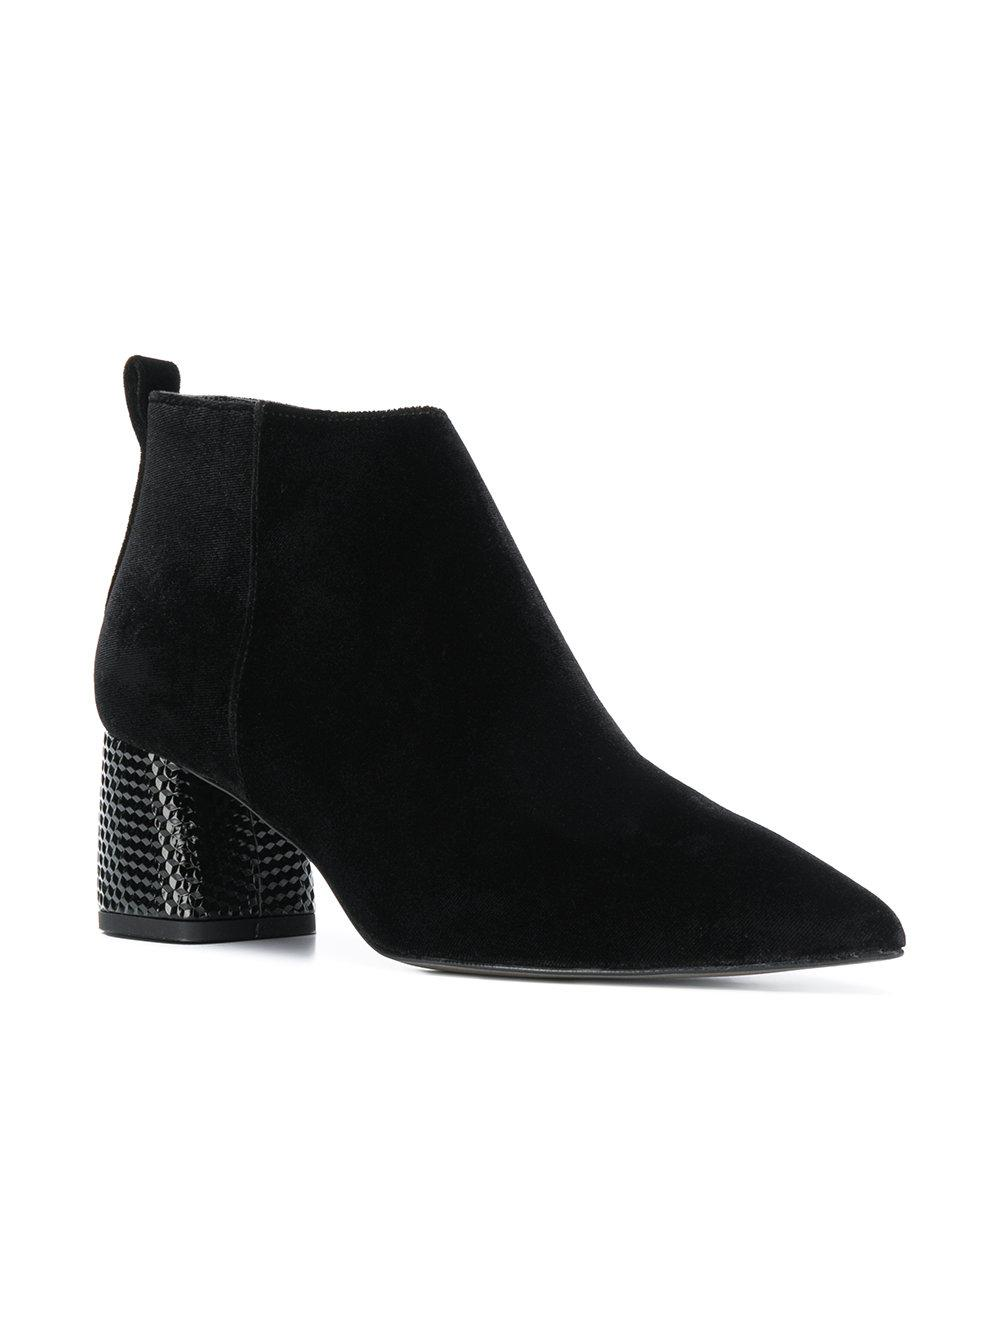 Pollini Velvet Embellished Chunky Heel Boots in Black